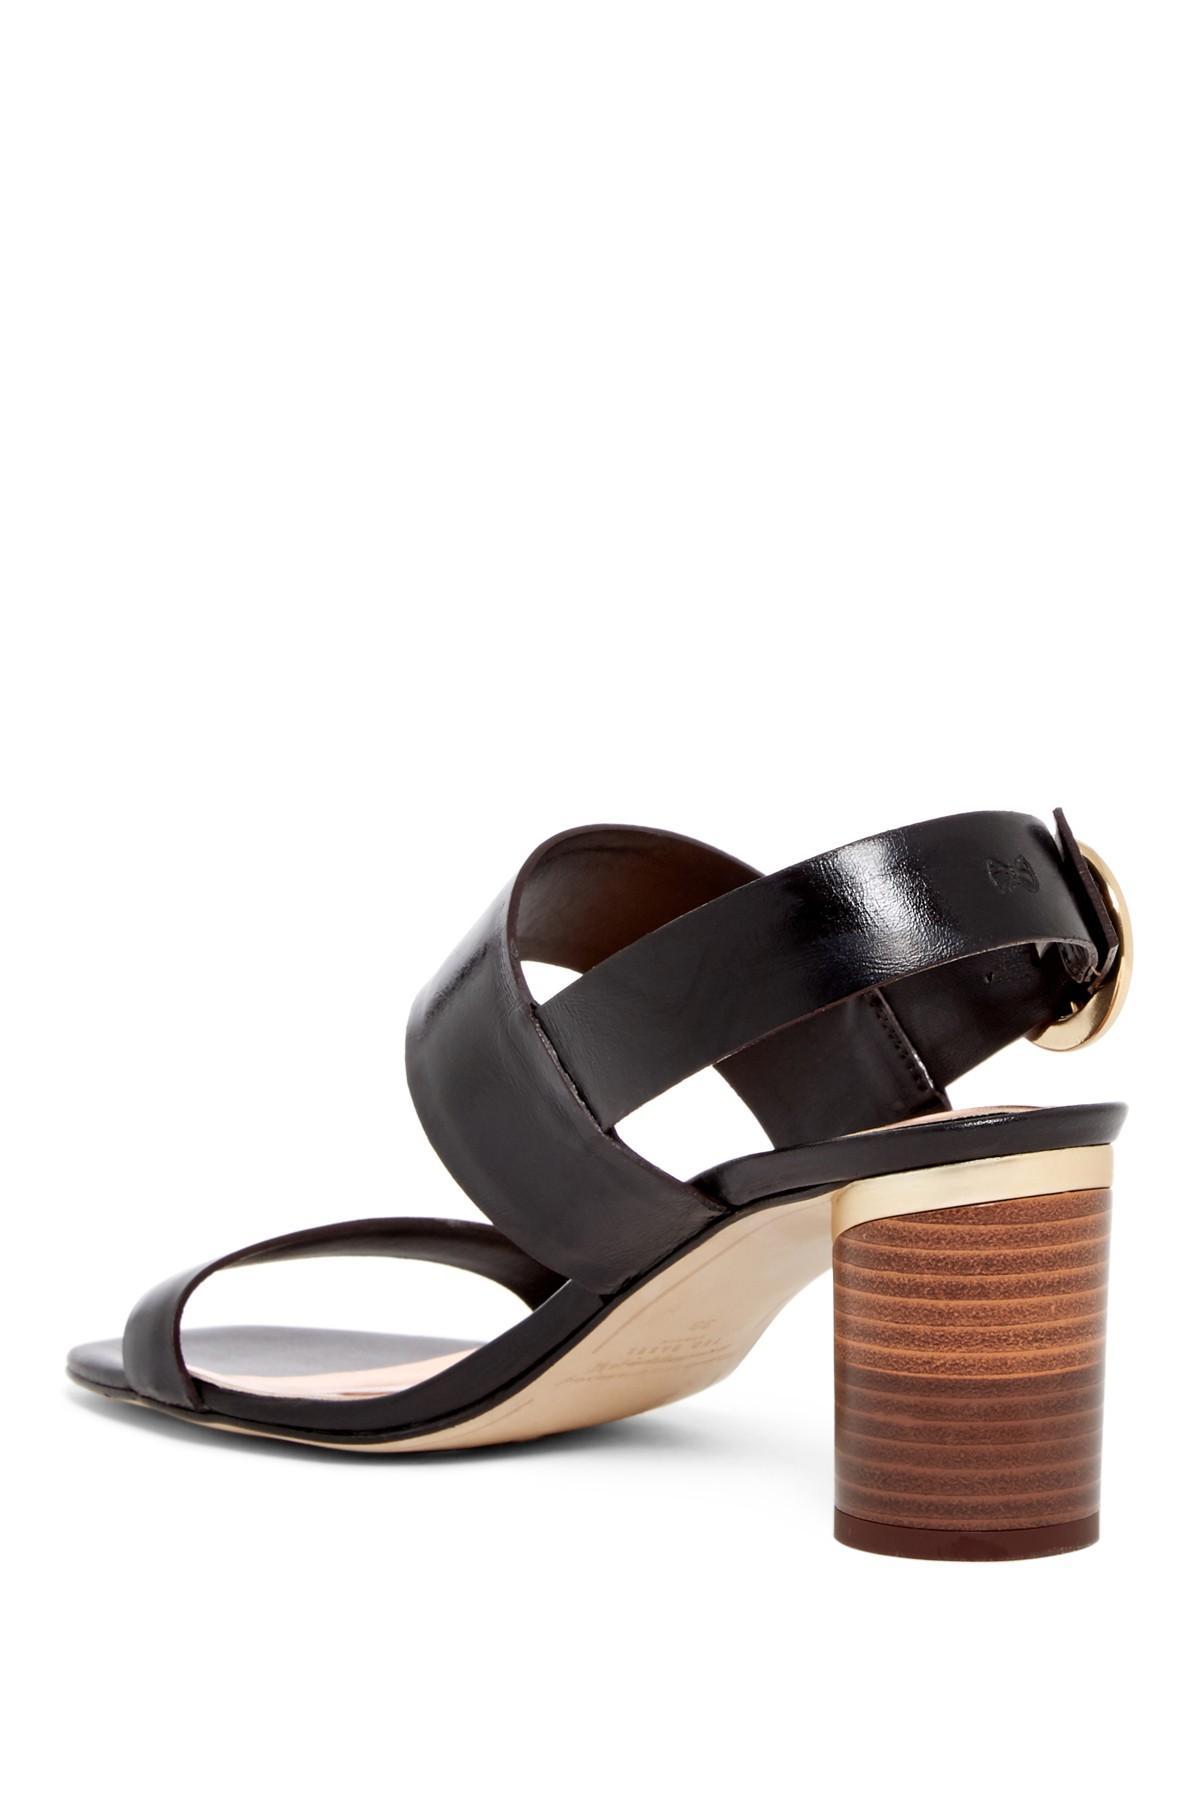 a80143e19c489 ... Azmara Block Heel Sandal - Lyst. View fullscreen